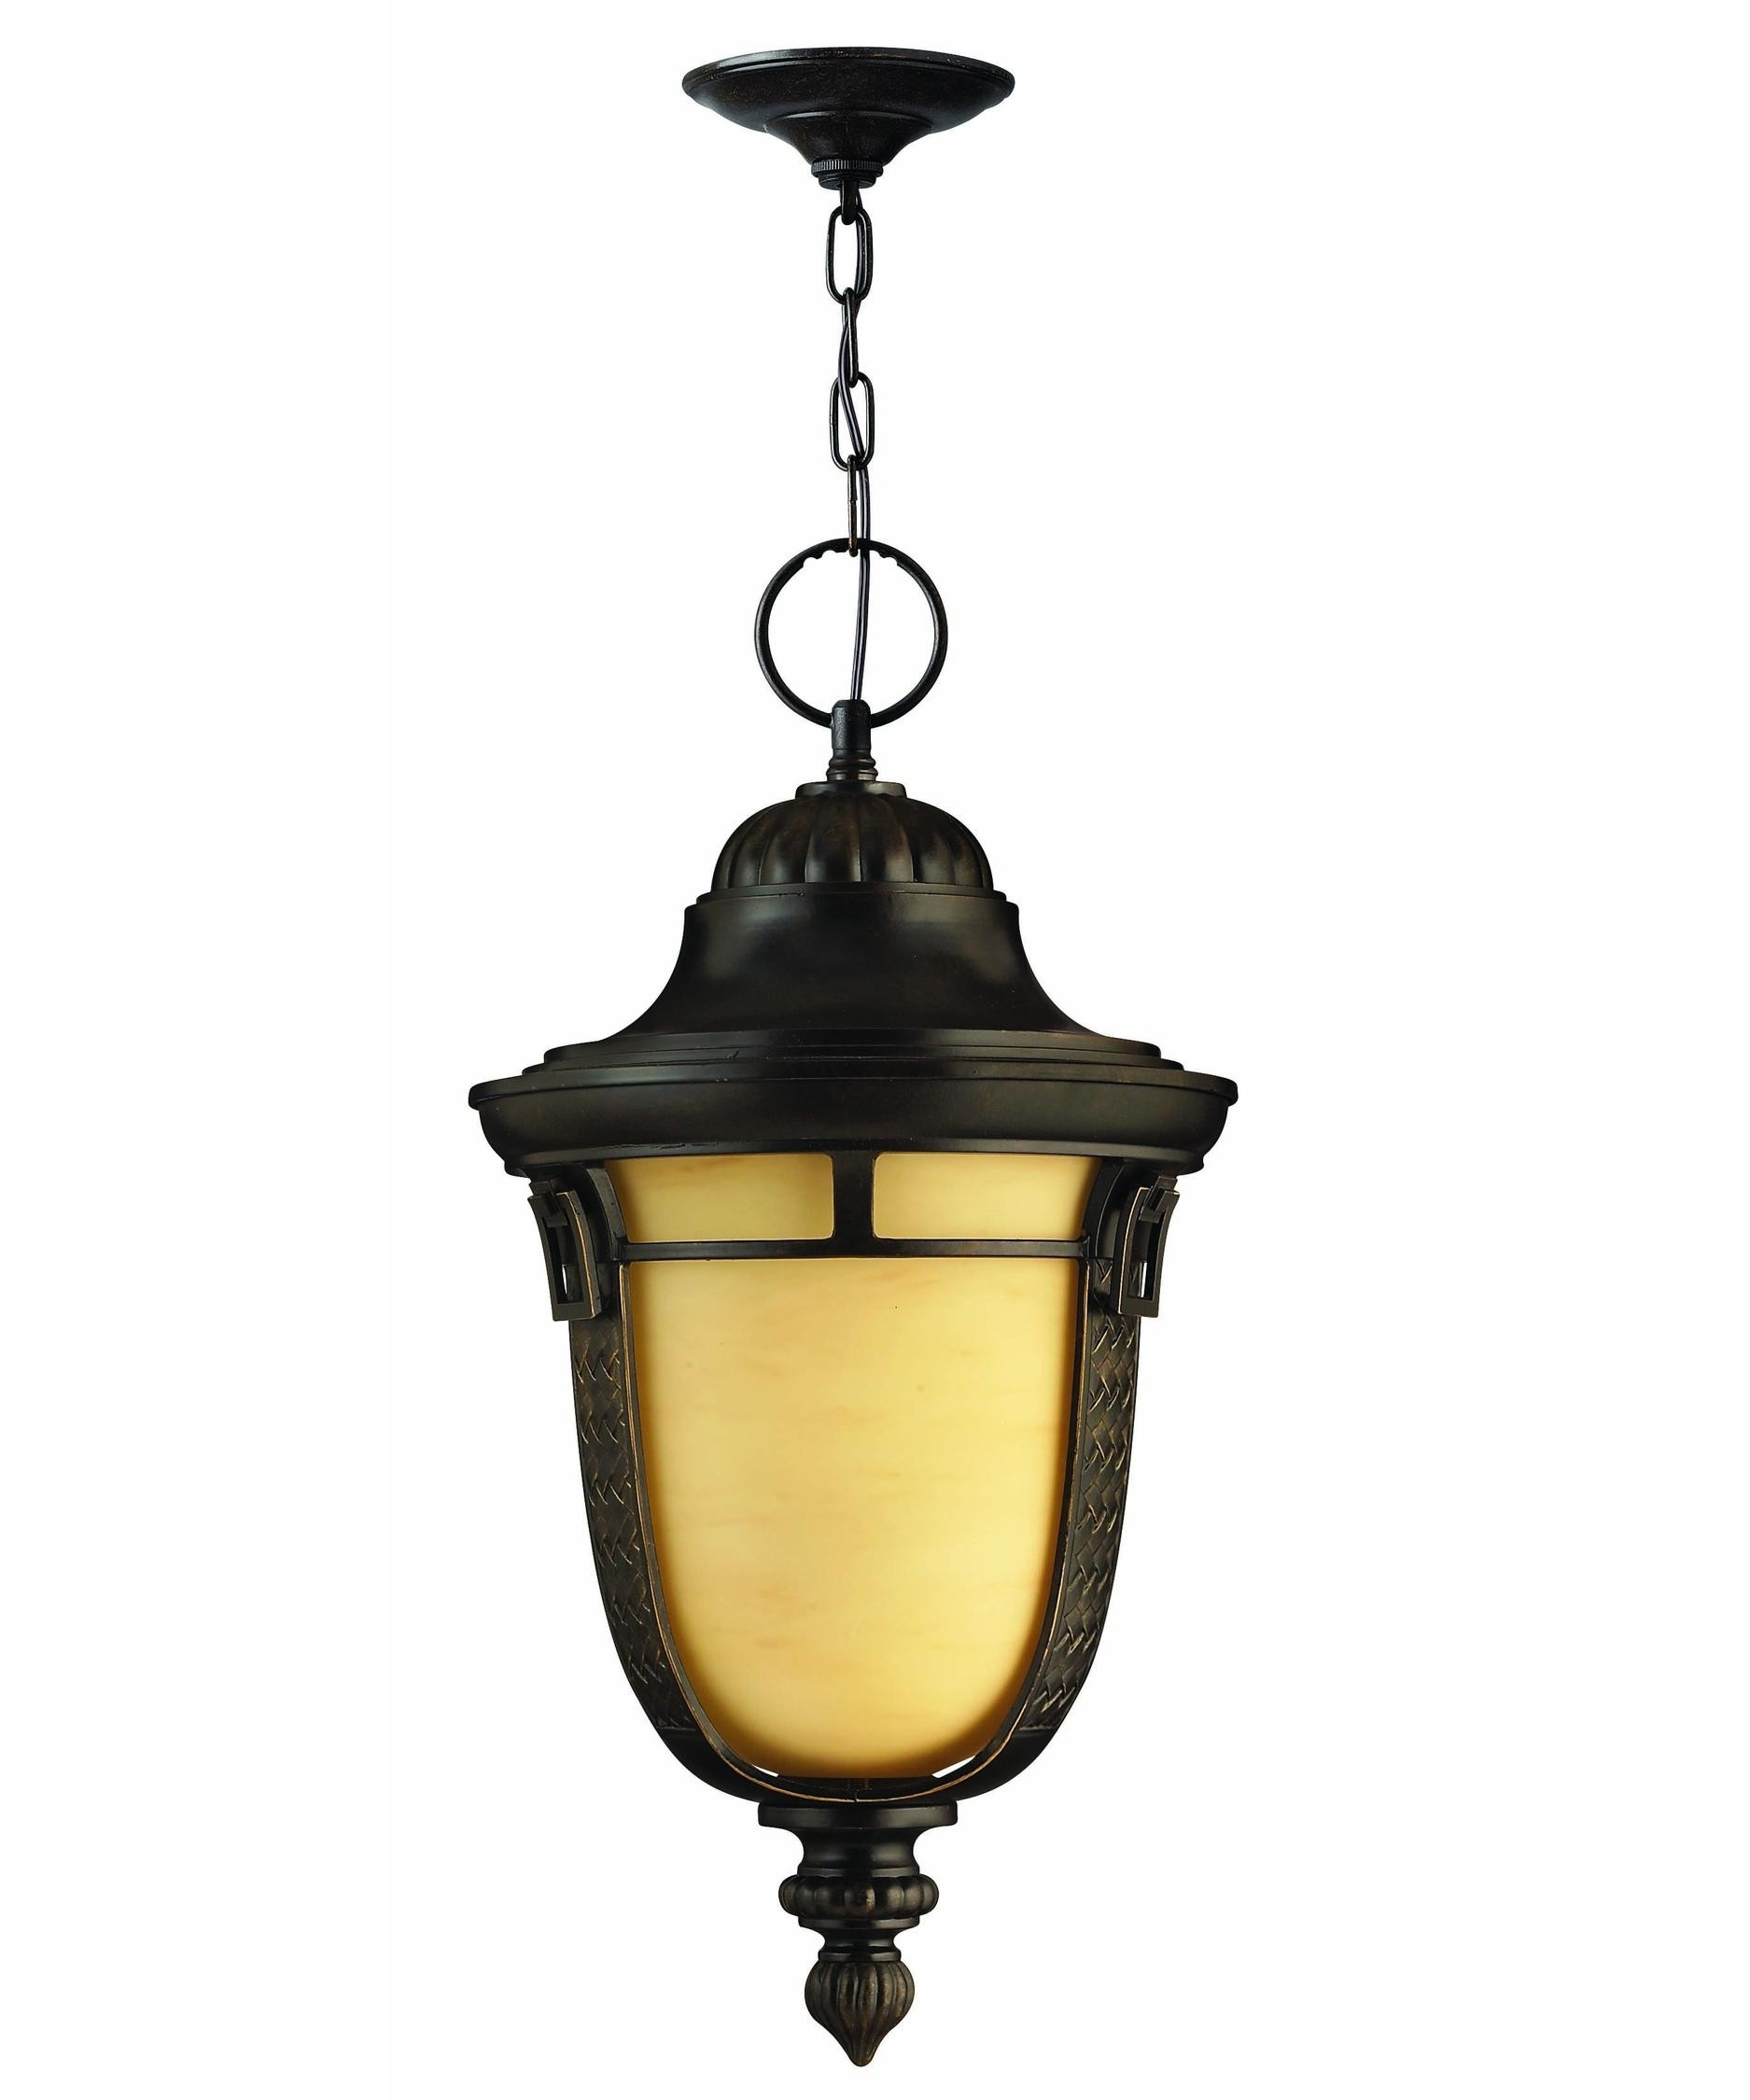 Outdoor String Lights Home Depot Inspirational Fixtures Light In Outdoor Hanging Barn Lights (#14 of 15)